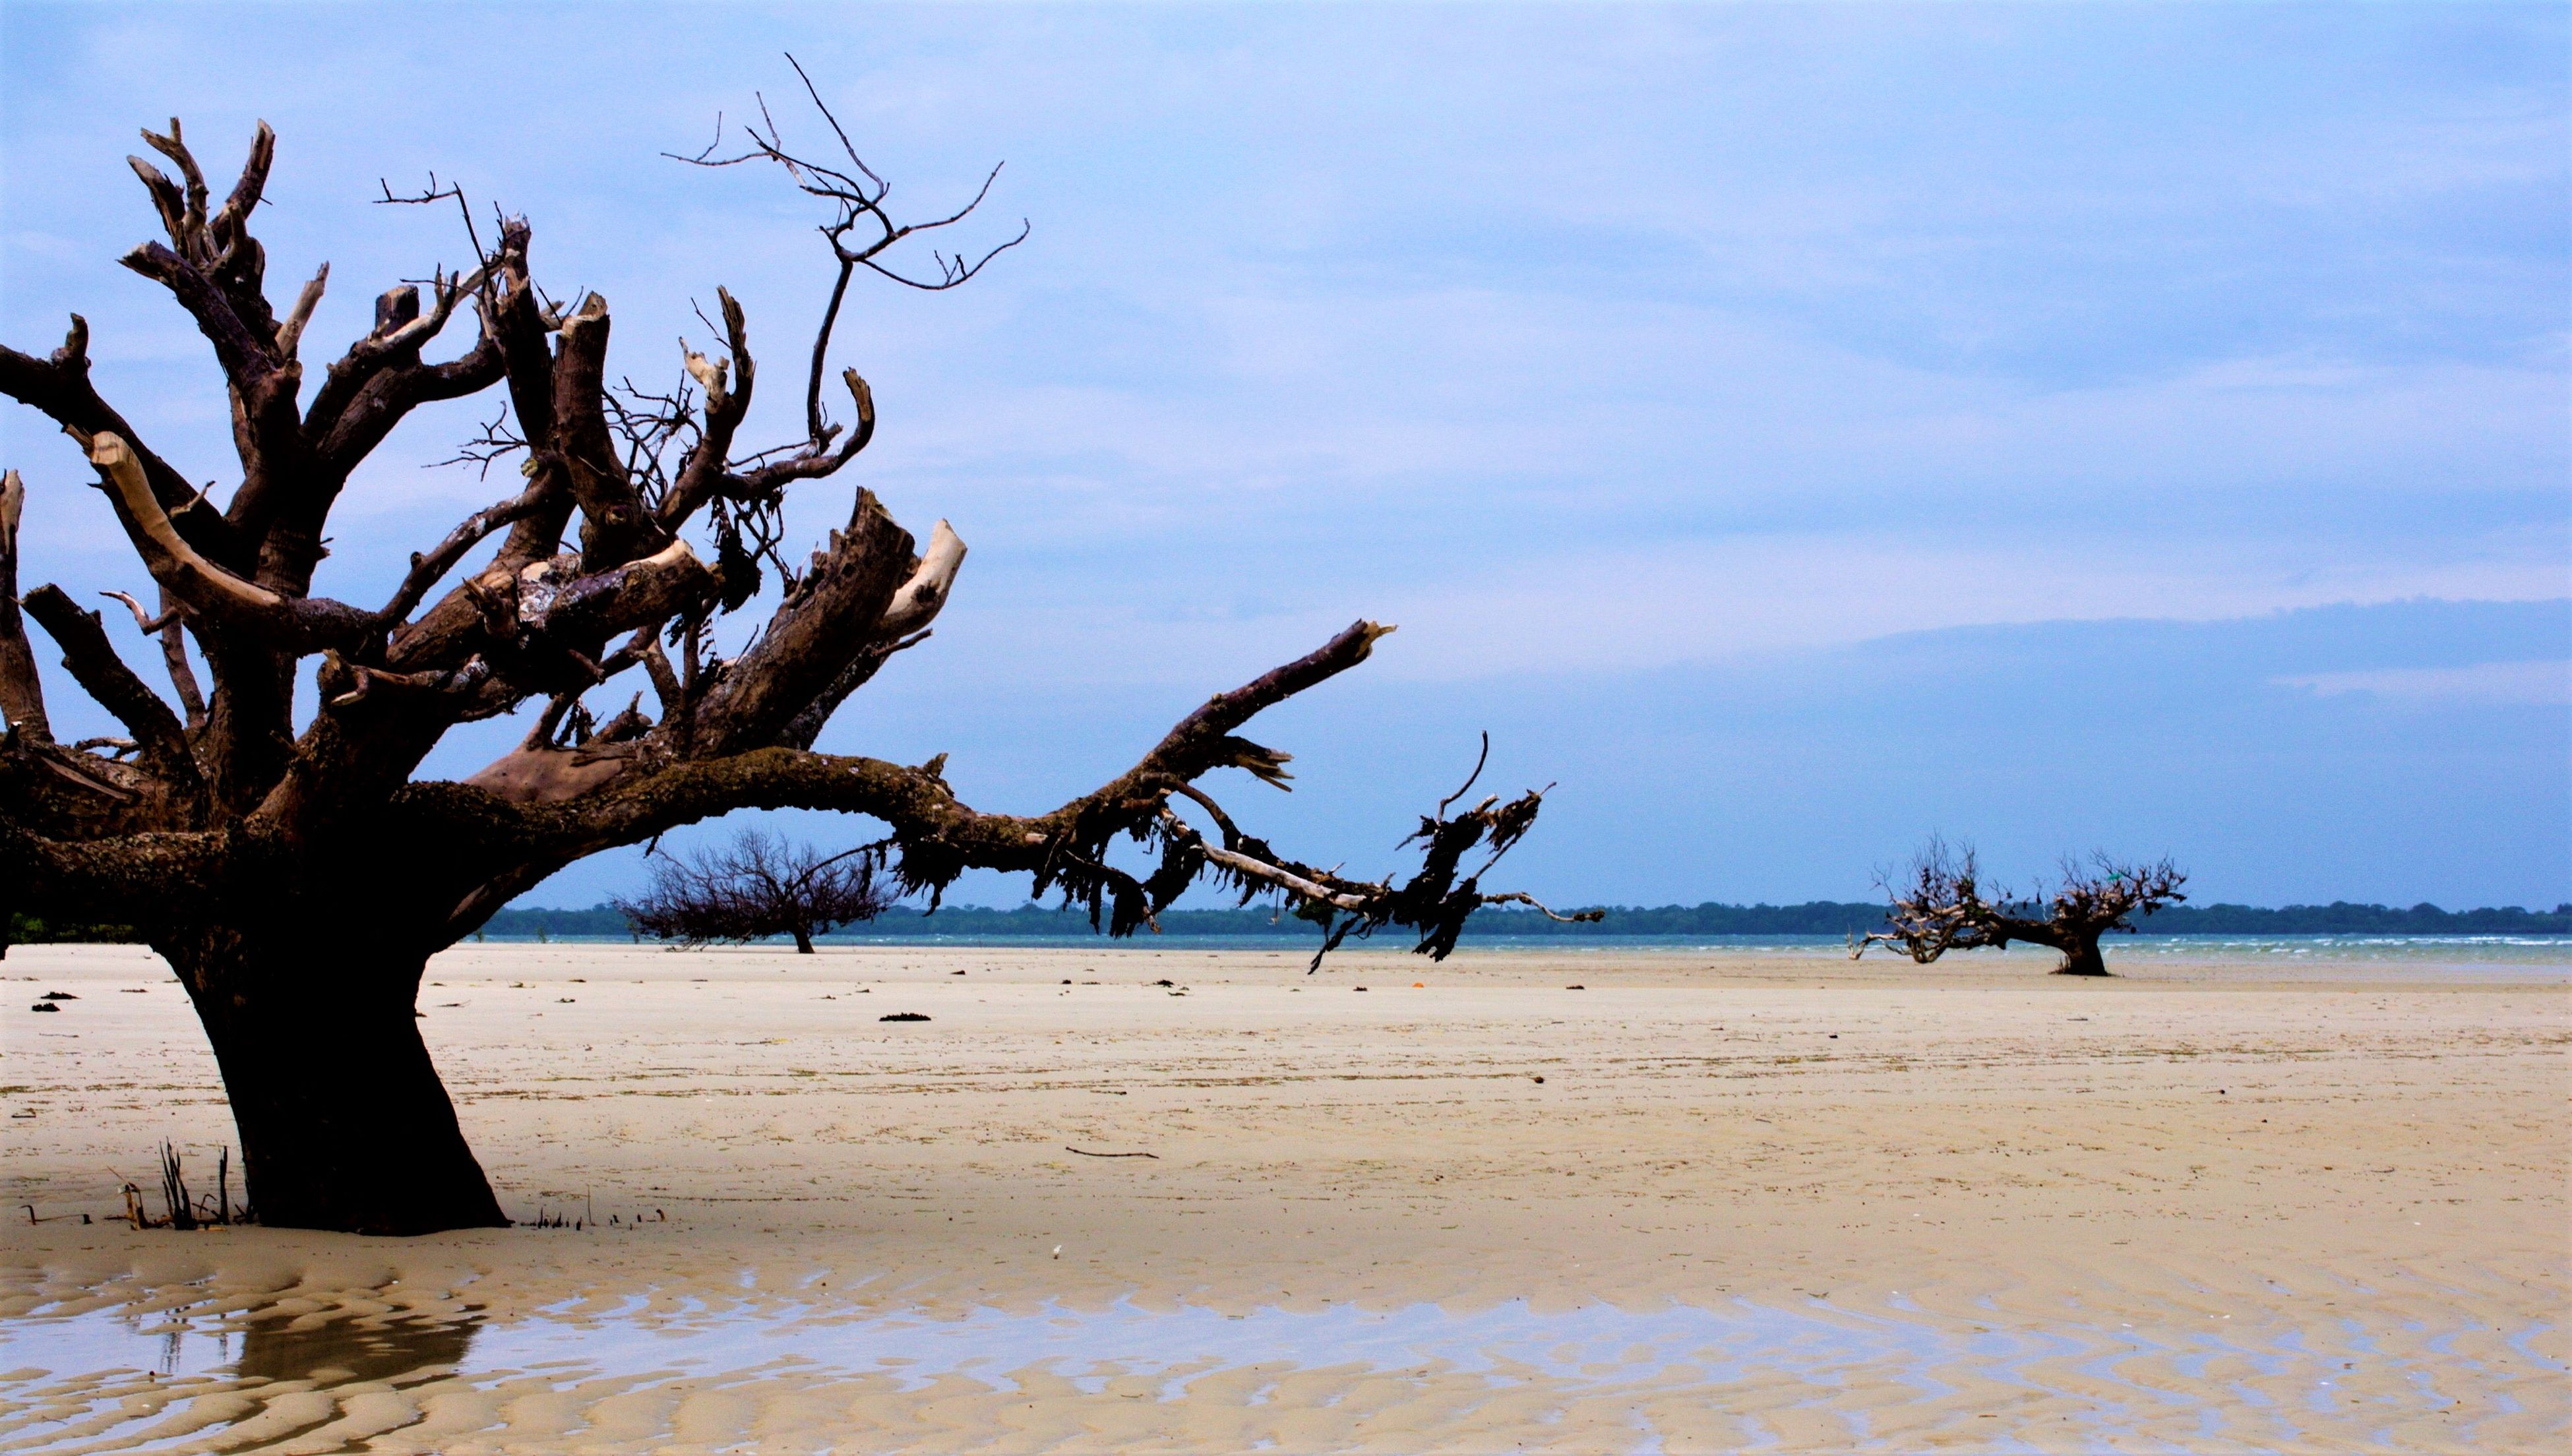 Fringe mangrove cut for fuelwood Coastal Degradation Degradation Gazi Bay Mangrove Cutting Mangrove Degradation Sonneratia Alba Tree Cutting